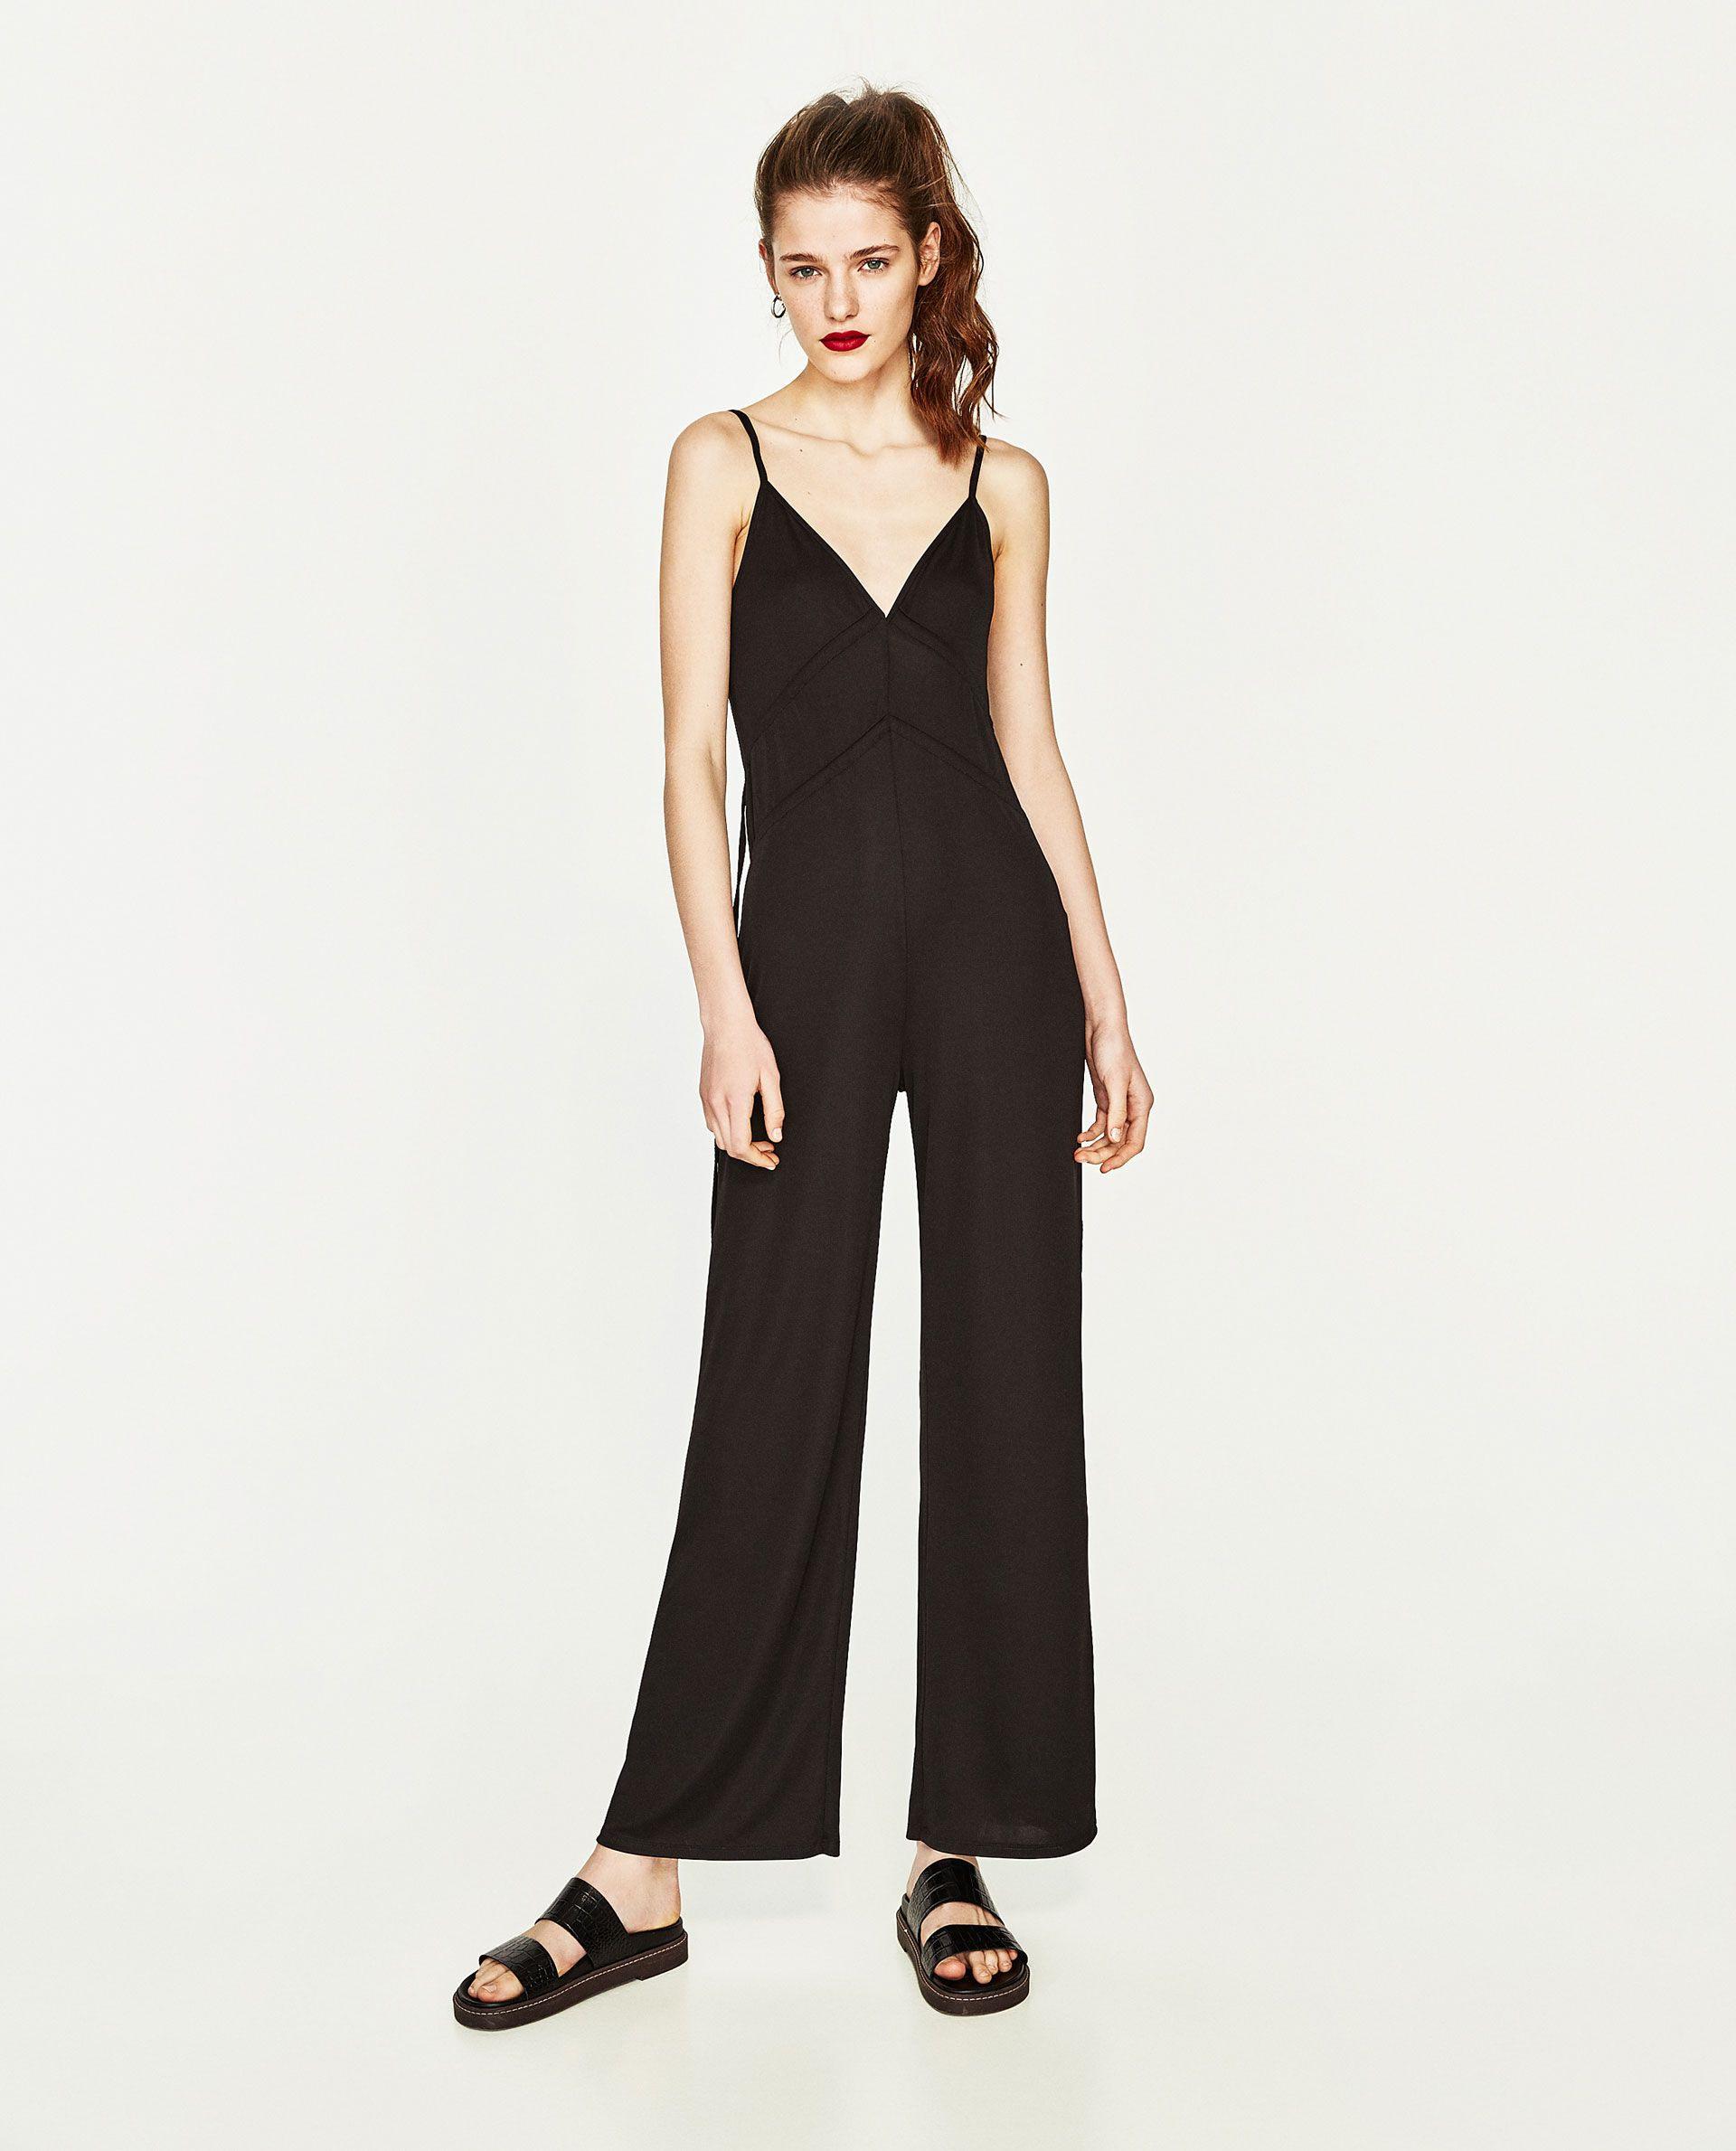 Zara  Woman  Long Jumpsuit With Cords  Zara Damen